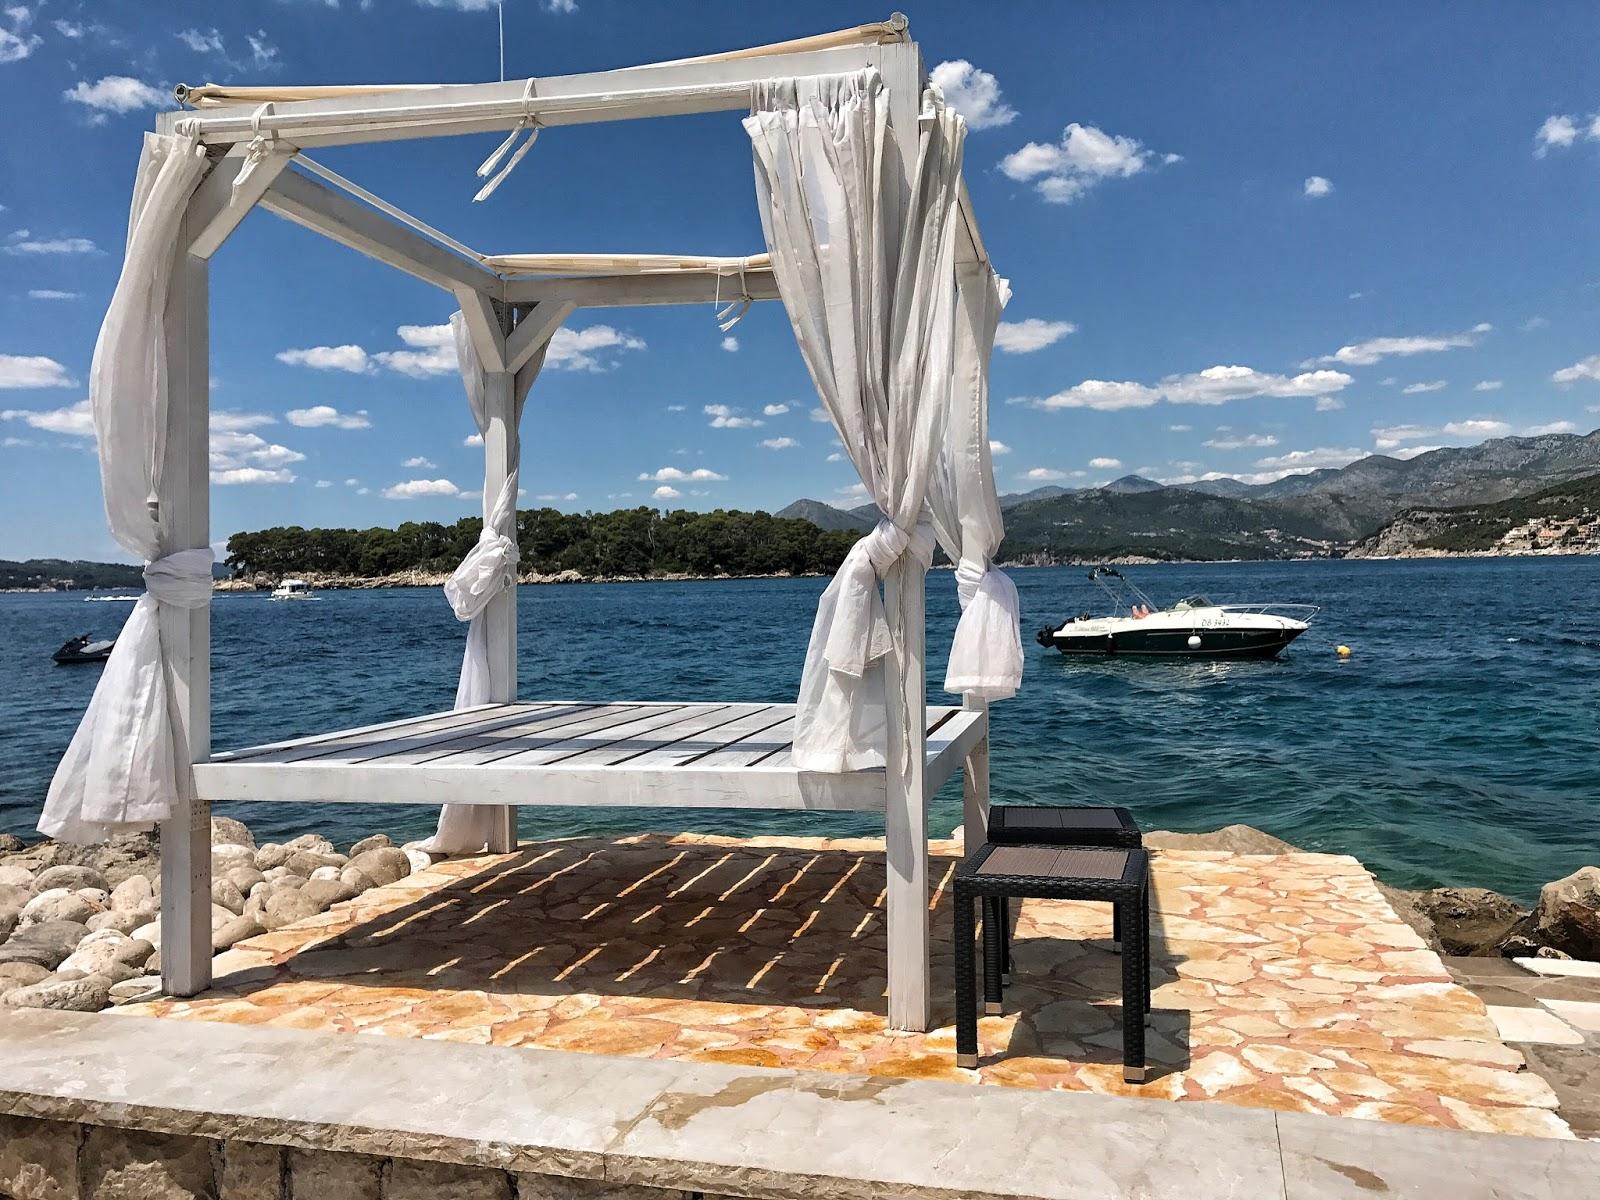 beach bed Copacana beach Dubrovnik Croatia